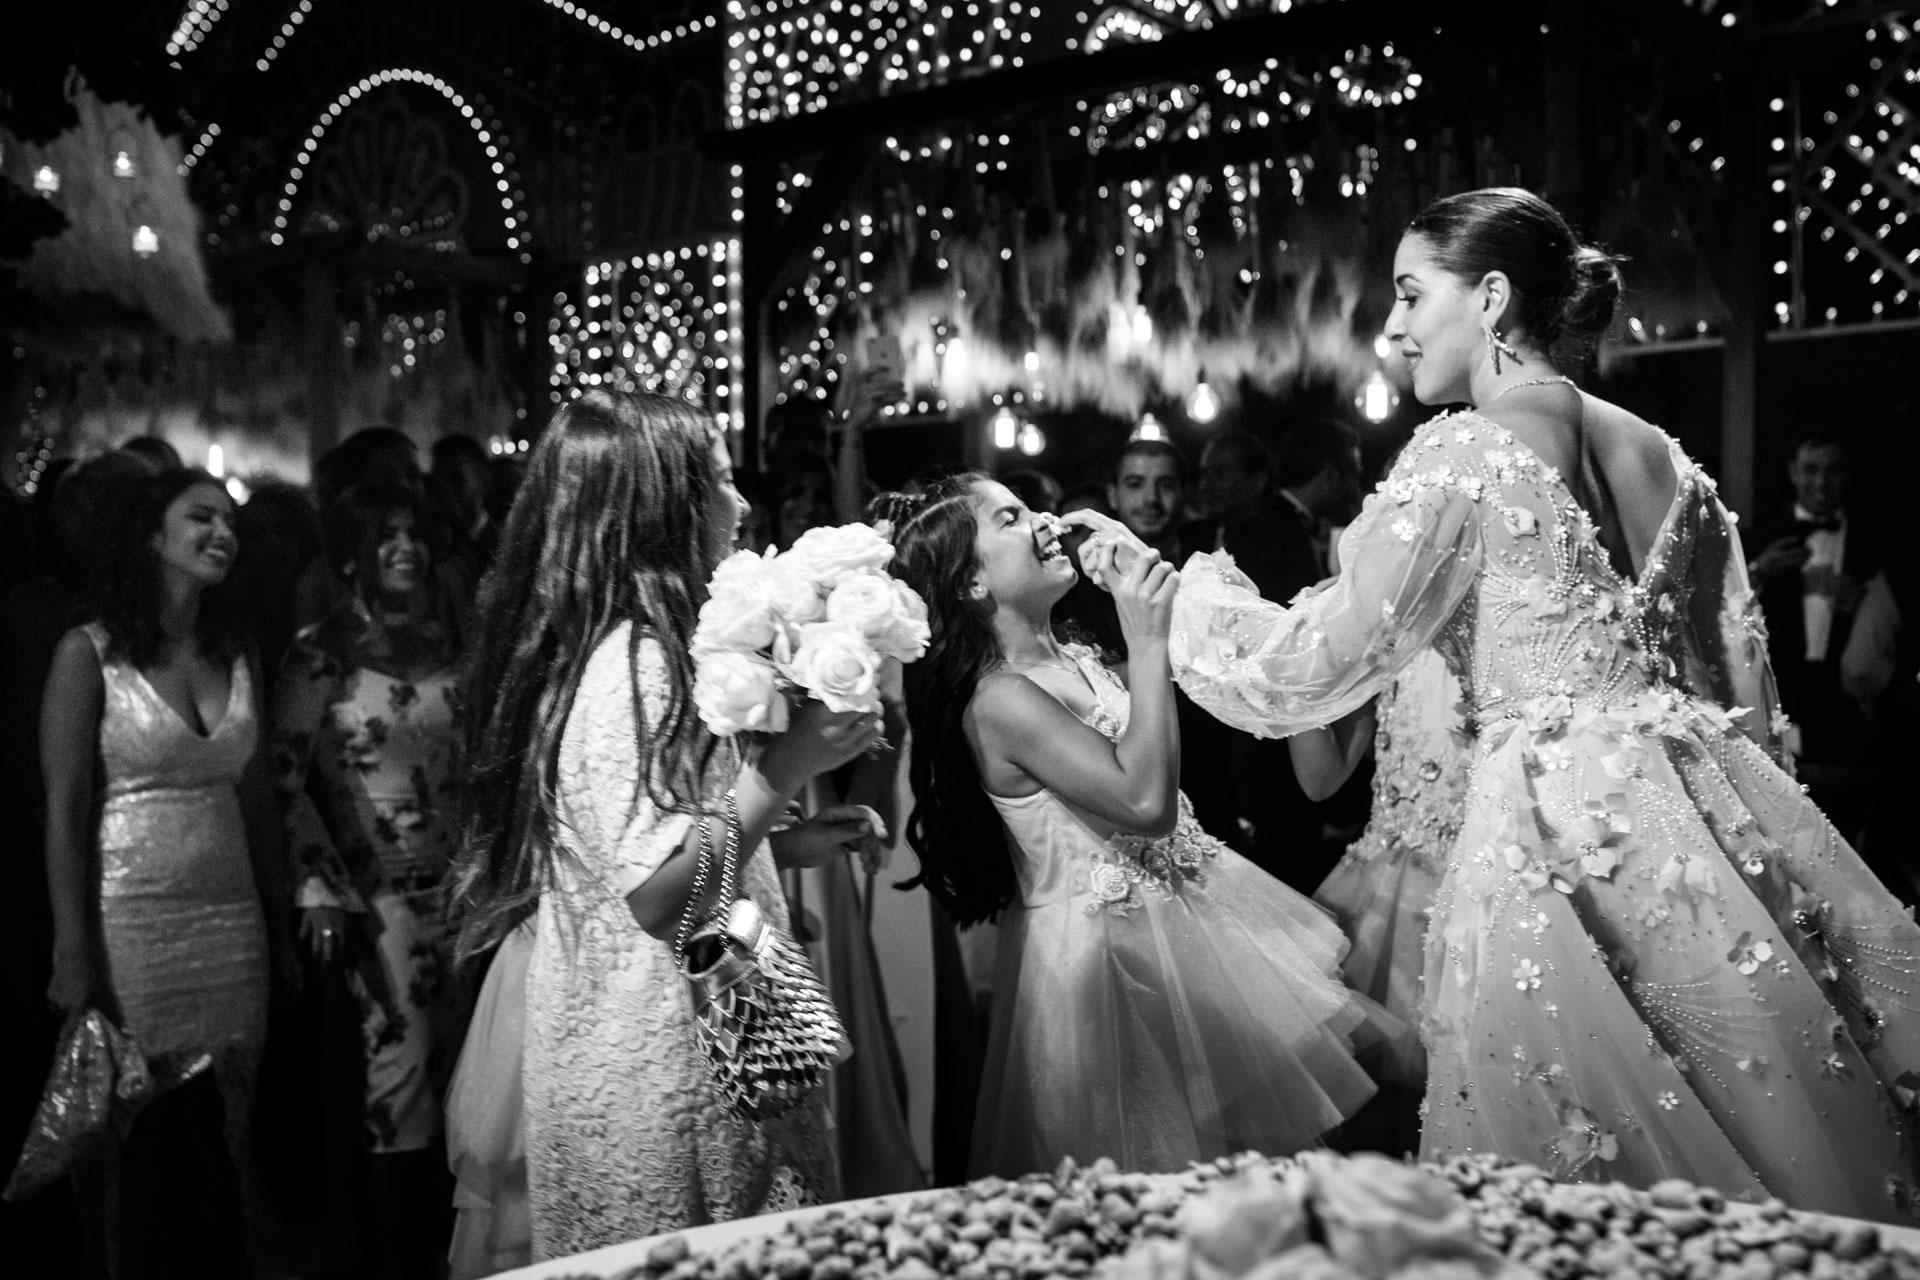 Joke - 69 :: Luxury wedding at Il Borro :: Luxury wedding photography - 68 :: Joke - 69